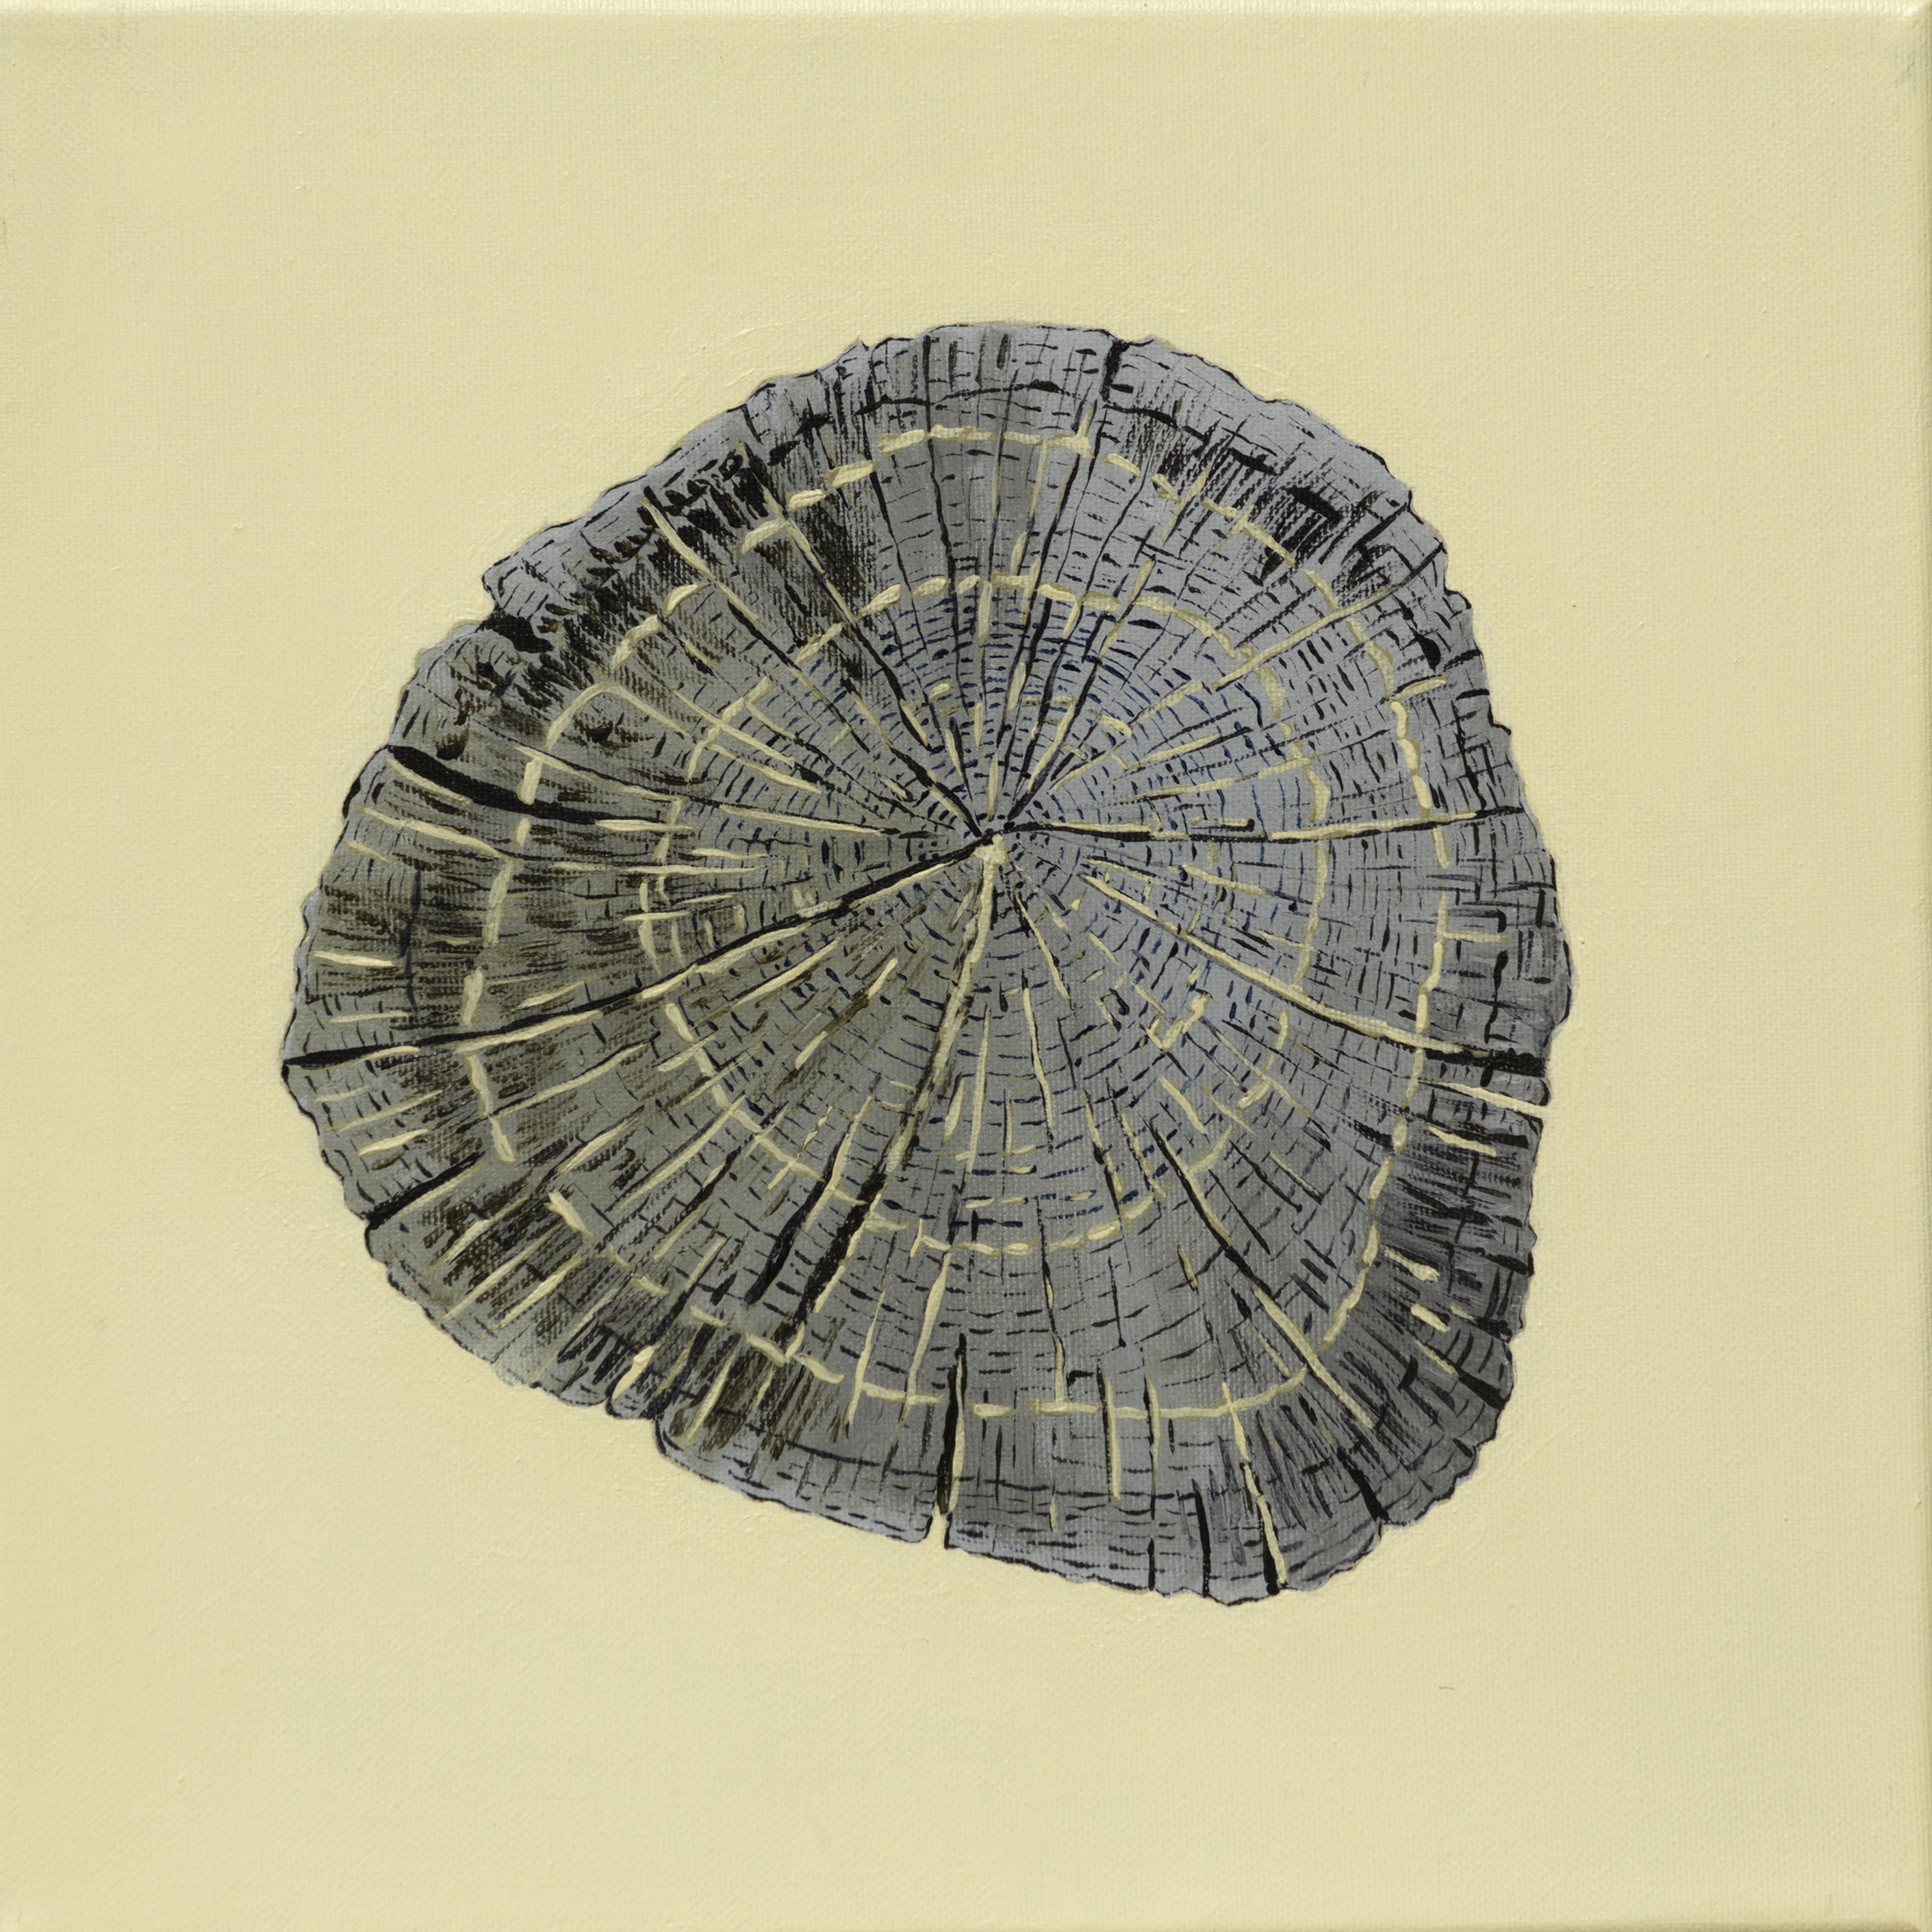 Paalkop 5 - acryl op canvas - 30 x 30 cm